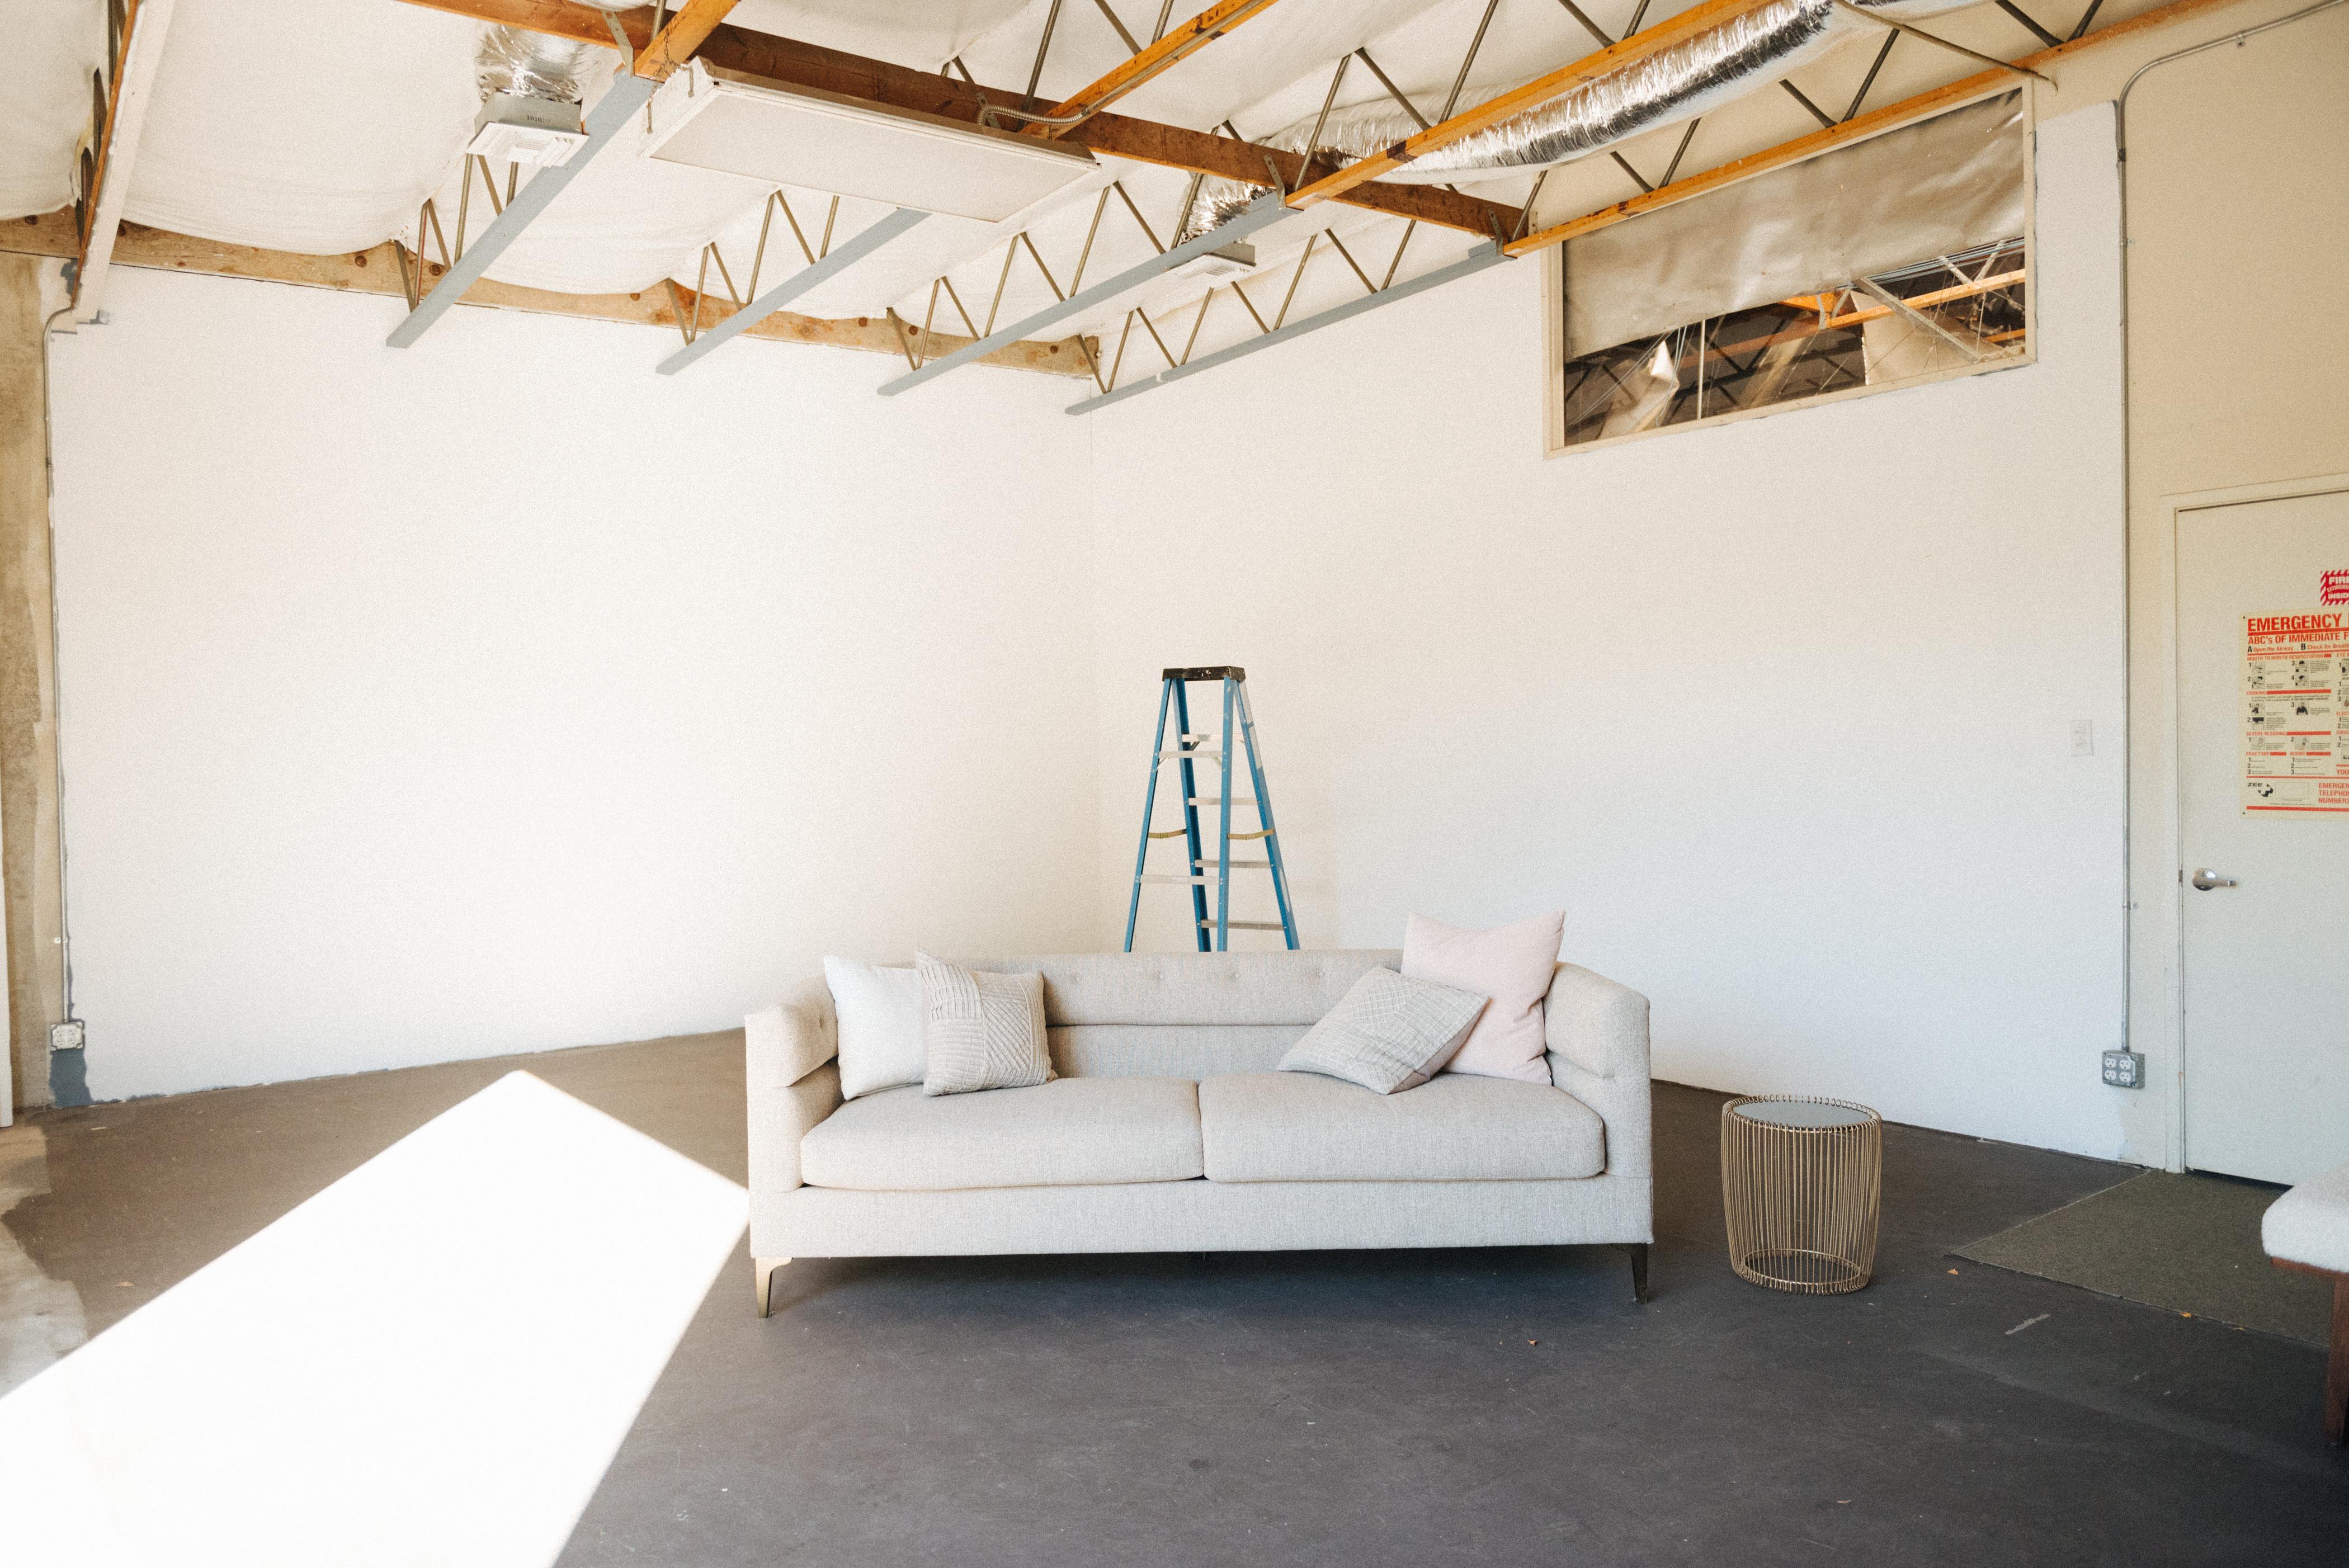 Second Space: The Studio